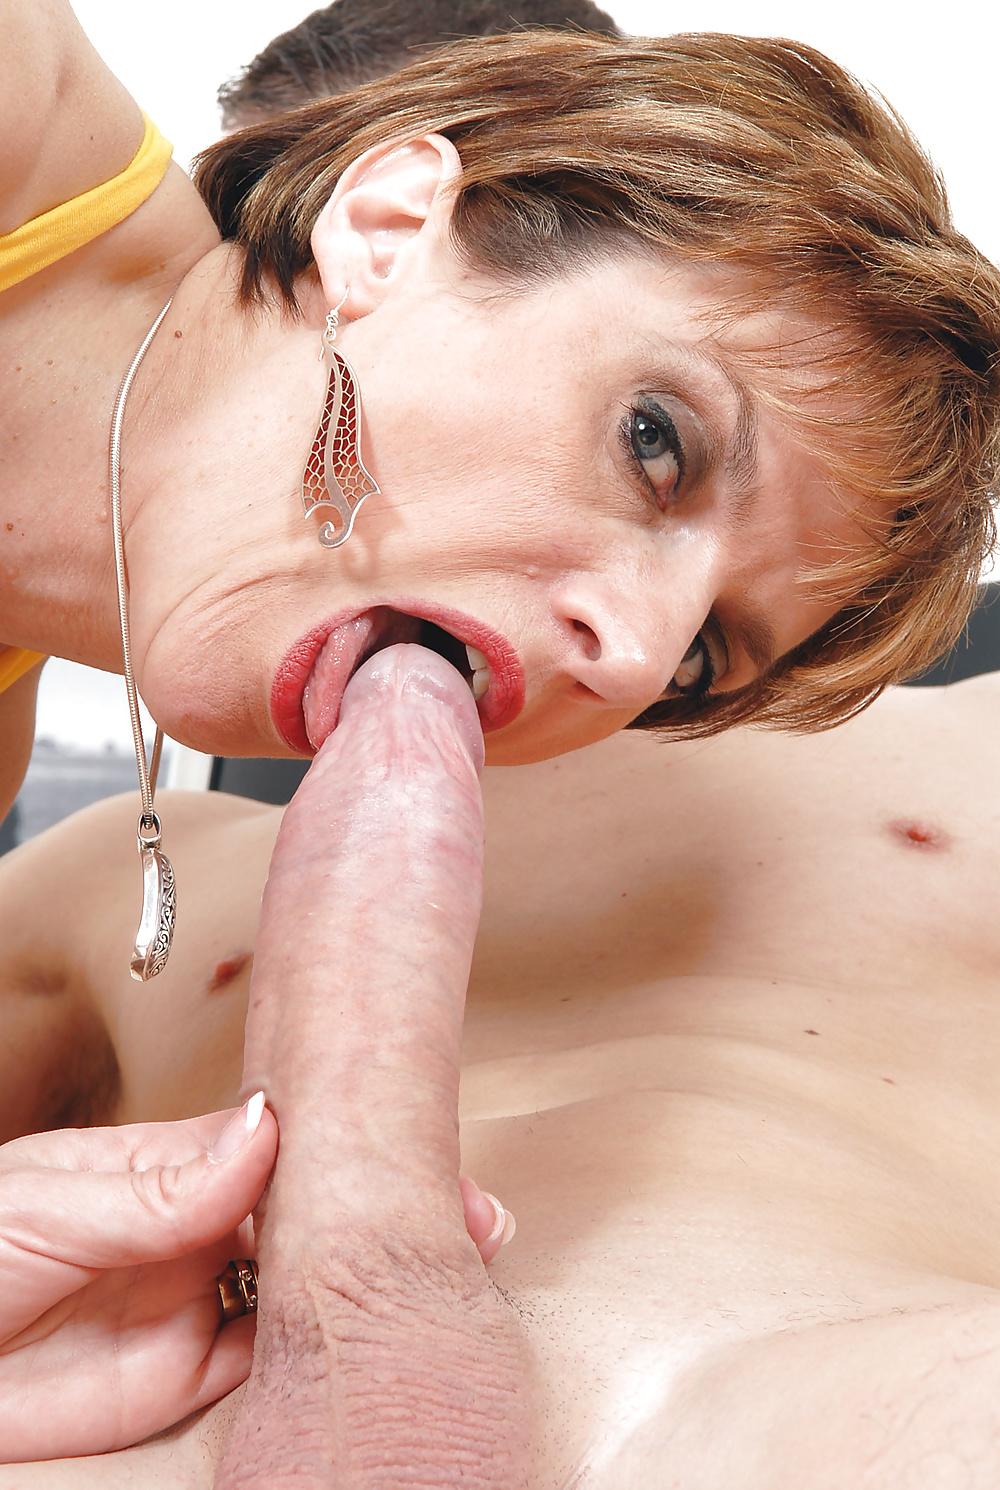 A cocksucking mature woman